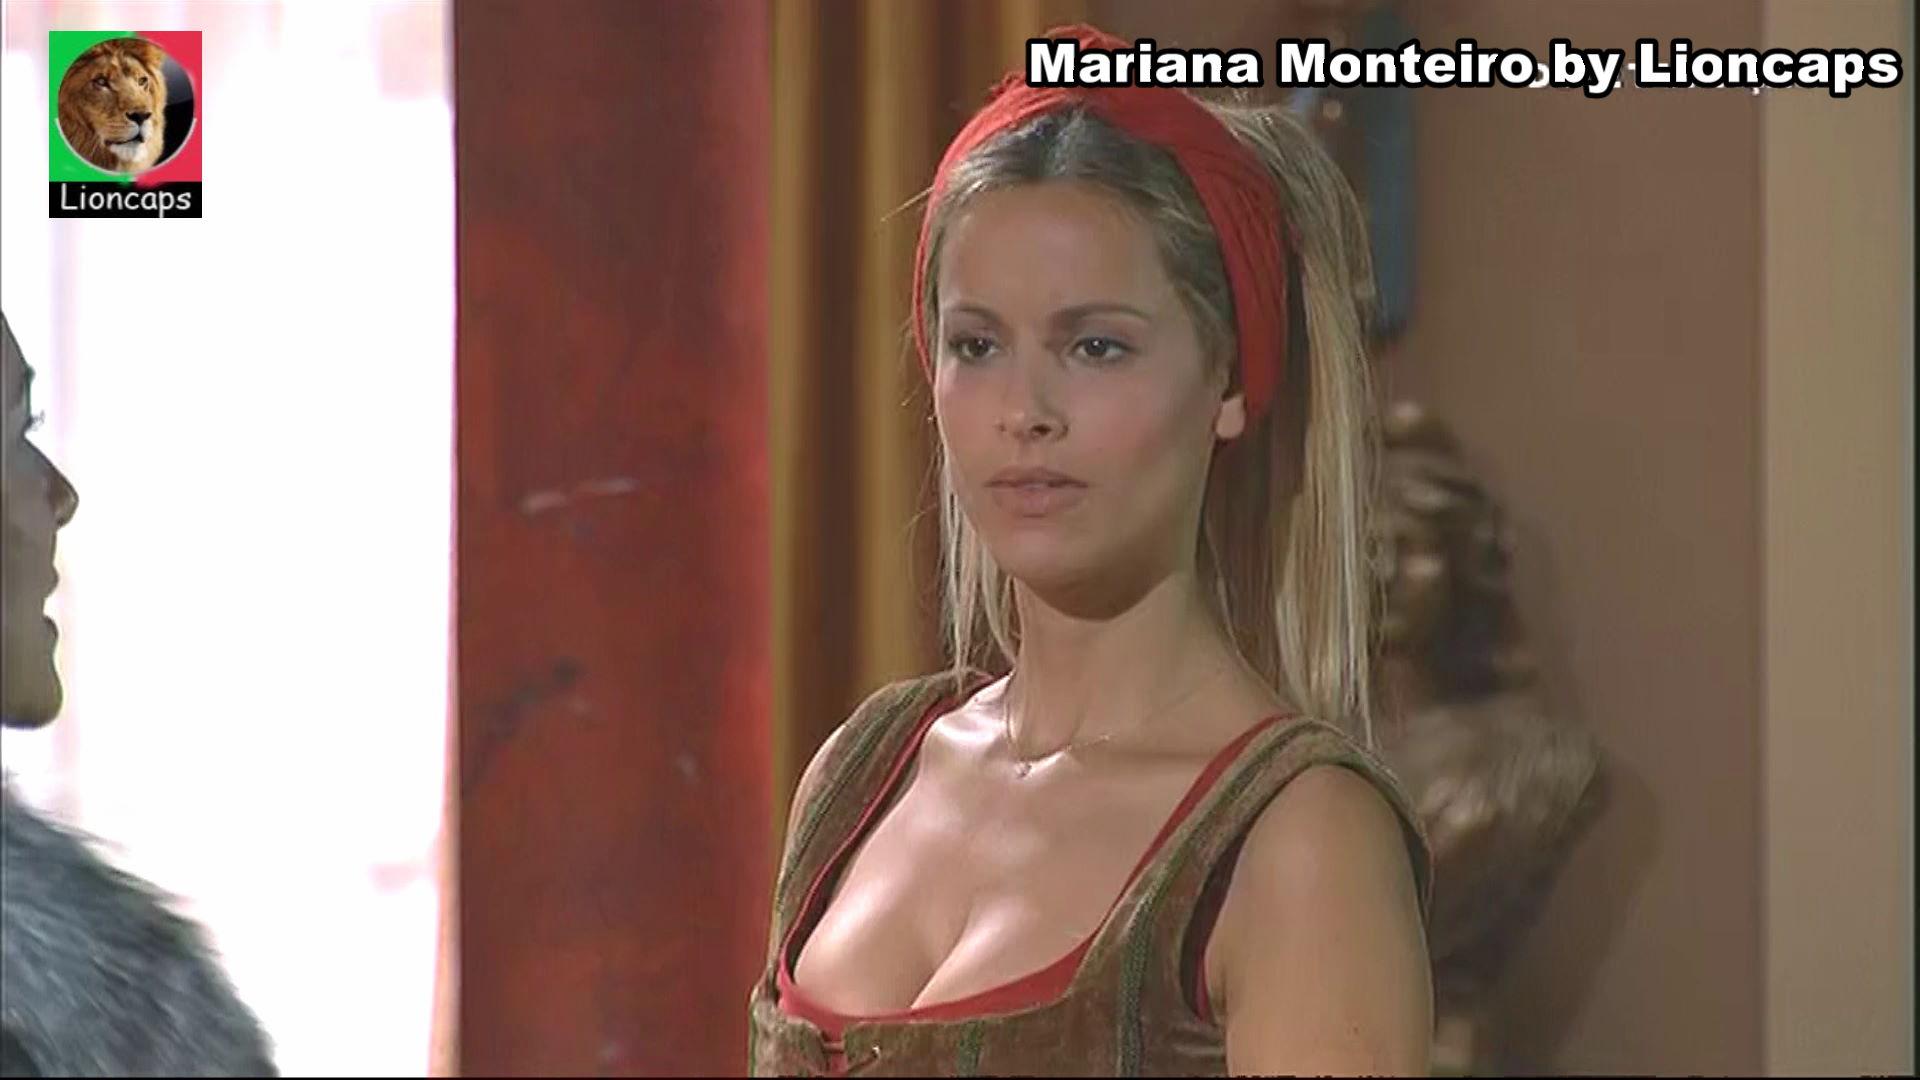 738380419_mariana_monteiro_vs190209_19211_122_487lo.JPG